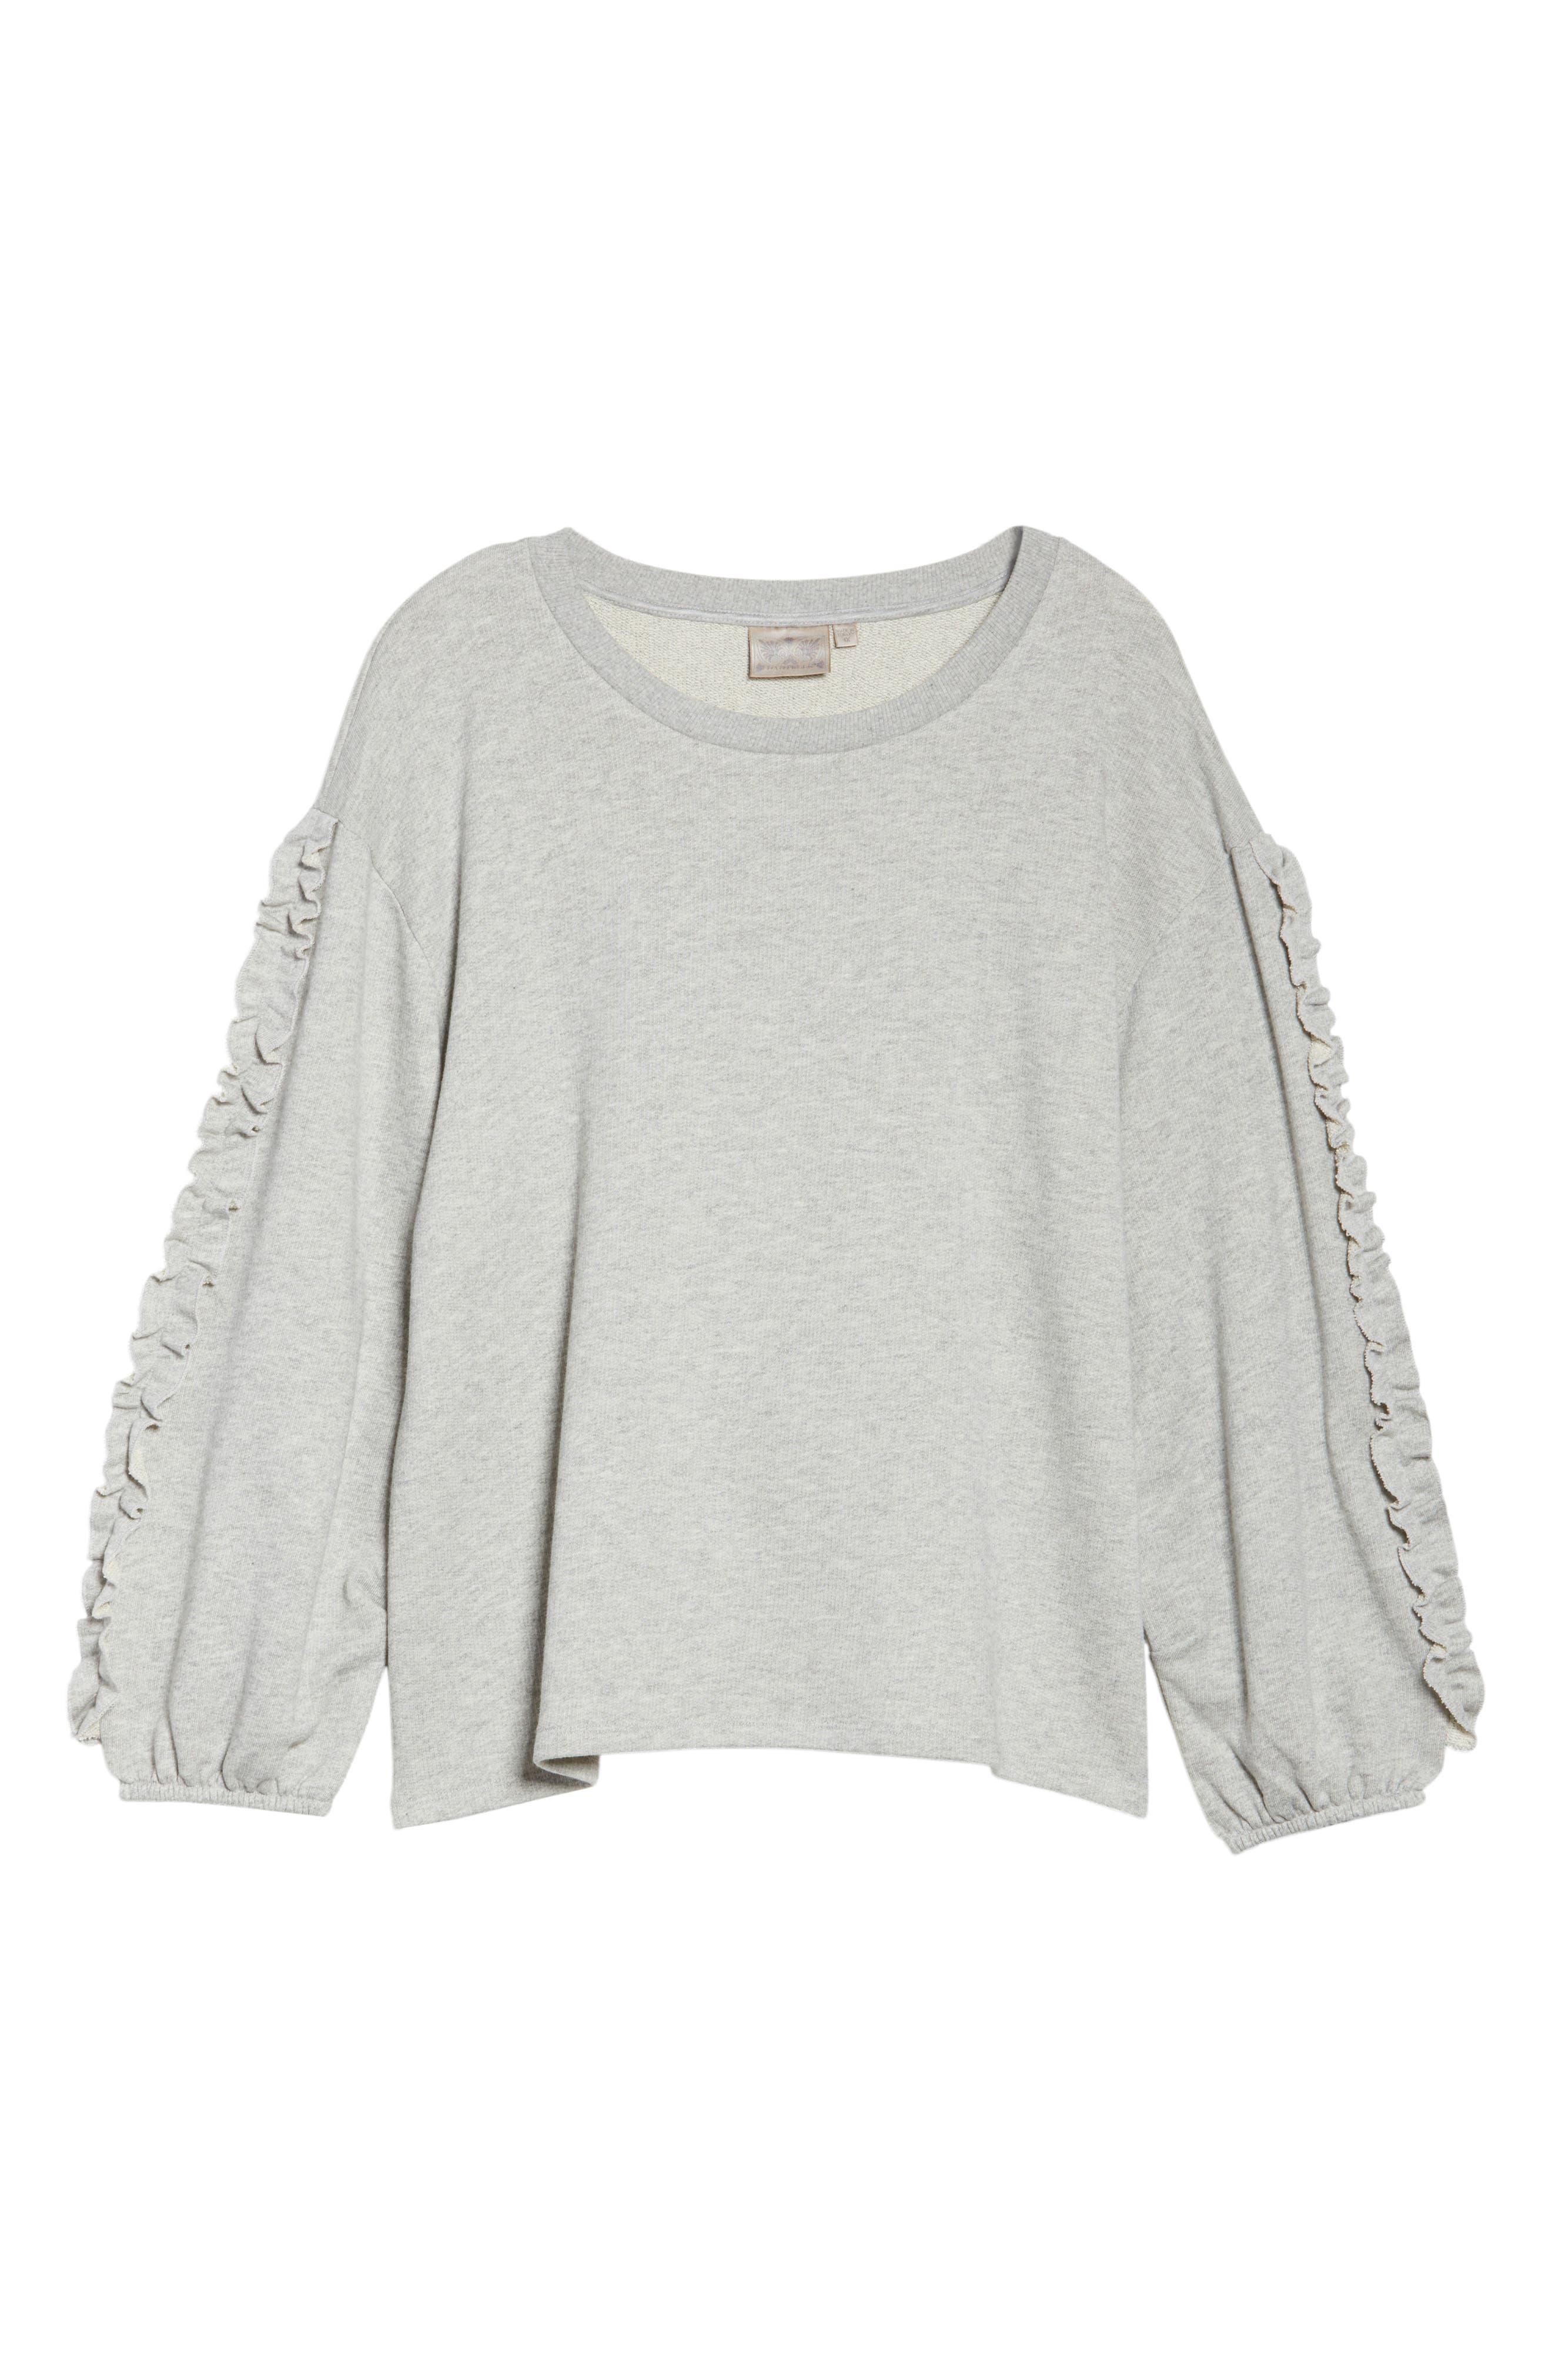 Ruffle Sleeve Sweatshirt,                             Alternate thumbnail 6, color,                             Grey Heather